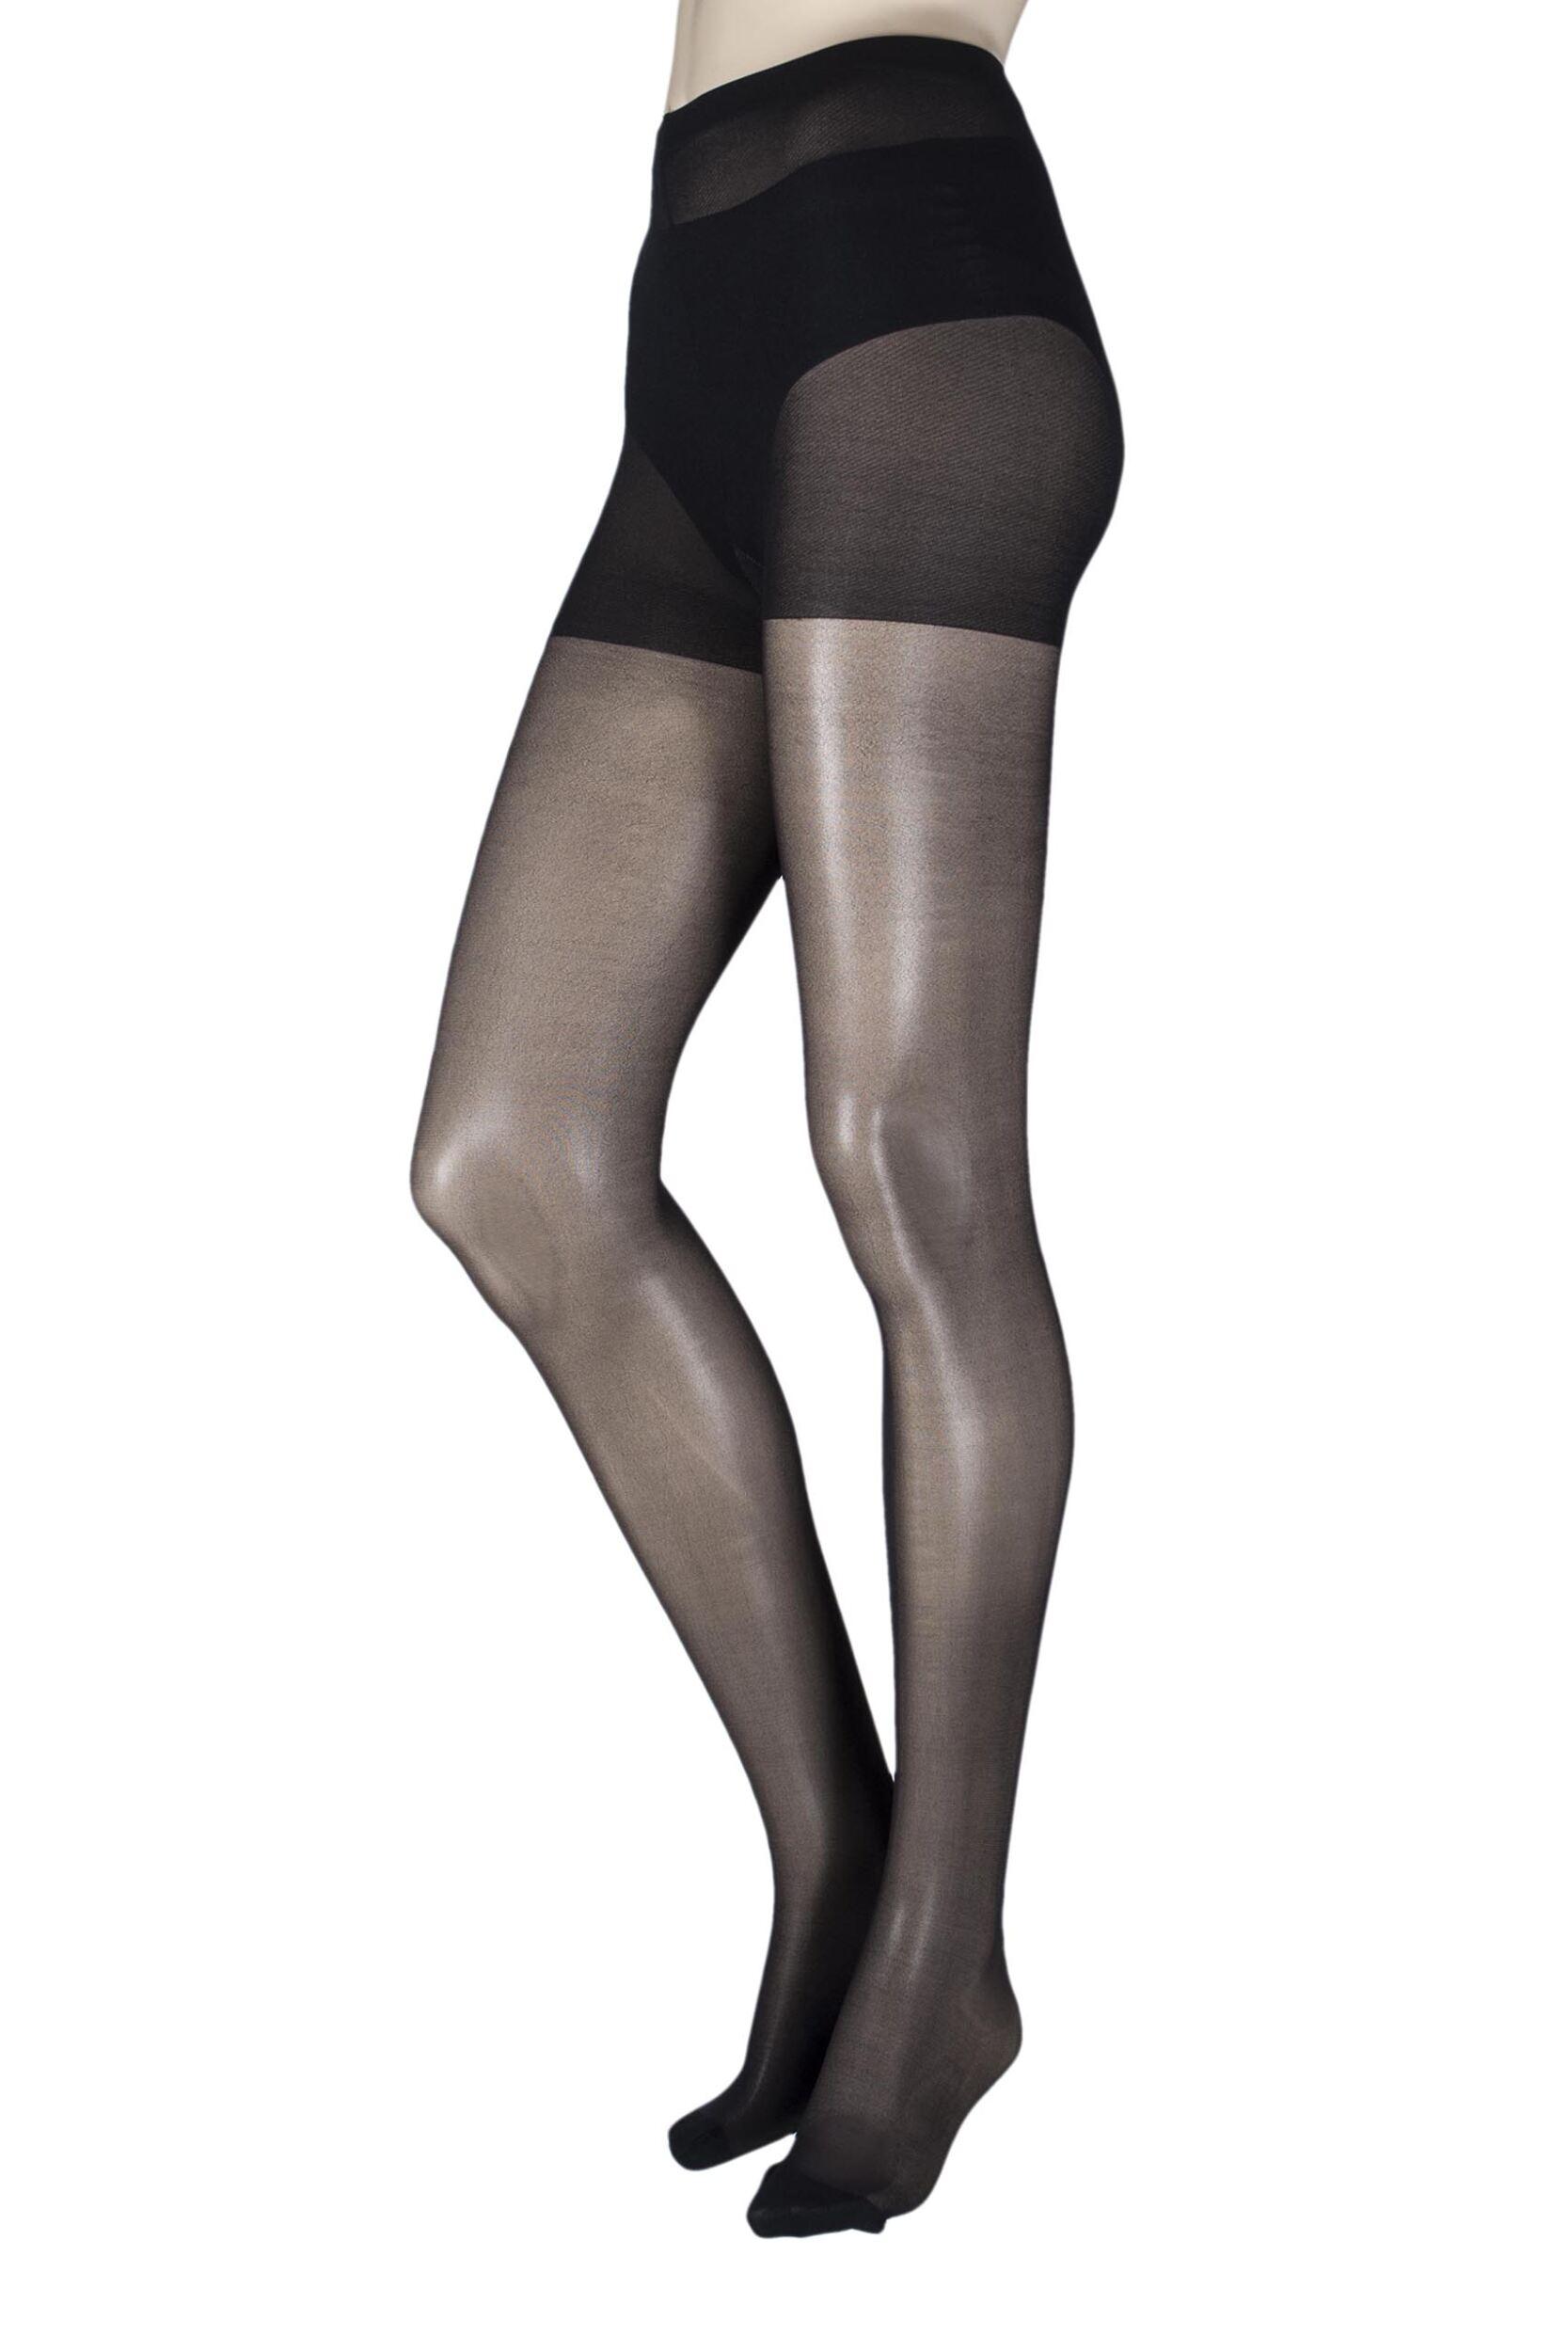 Image of 1 Pair Black 15 Denier Revitaliser Soft Shine Compression Tights Ladies Medium/Large - Pretty Legs